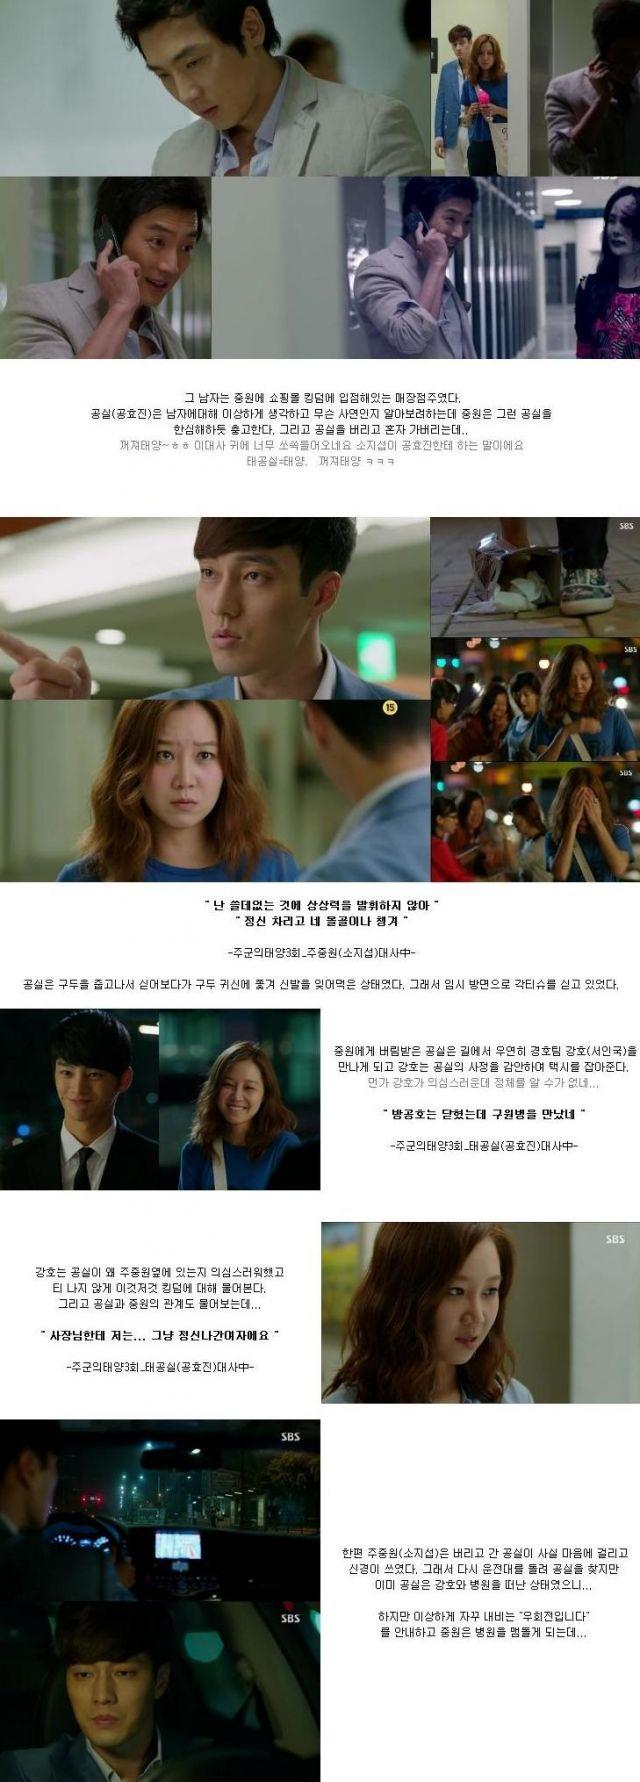 "Added episode 3 captures for the Korean drama "" Master's Sun "" (2013)"